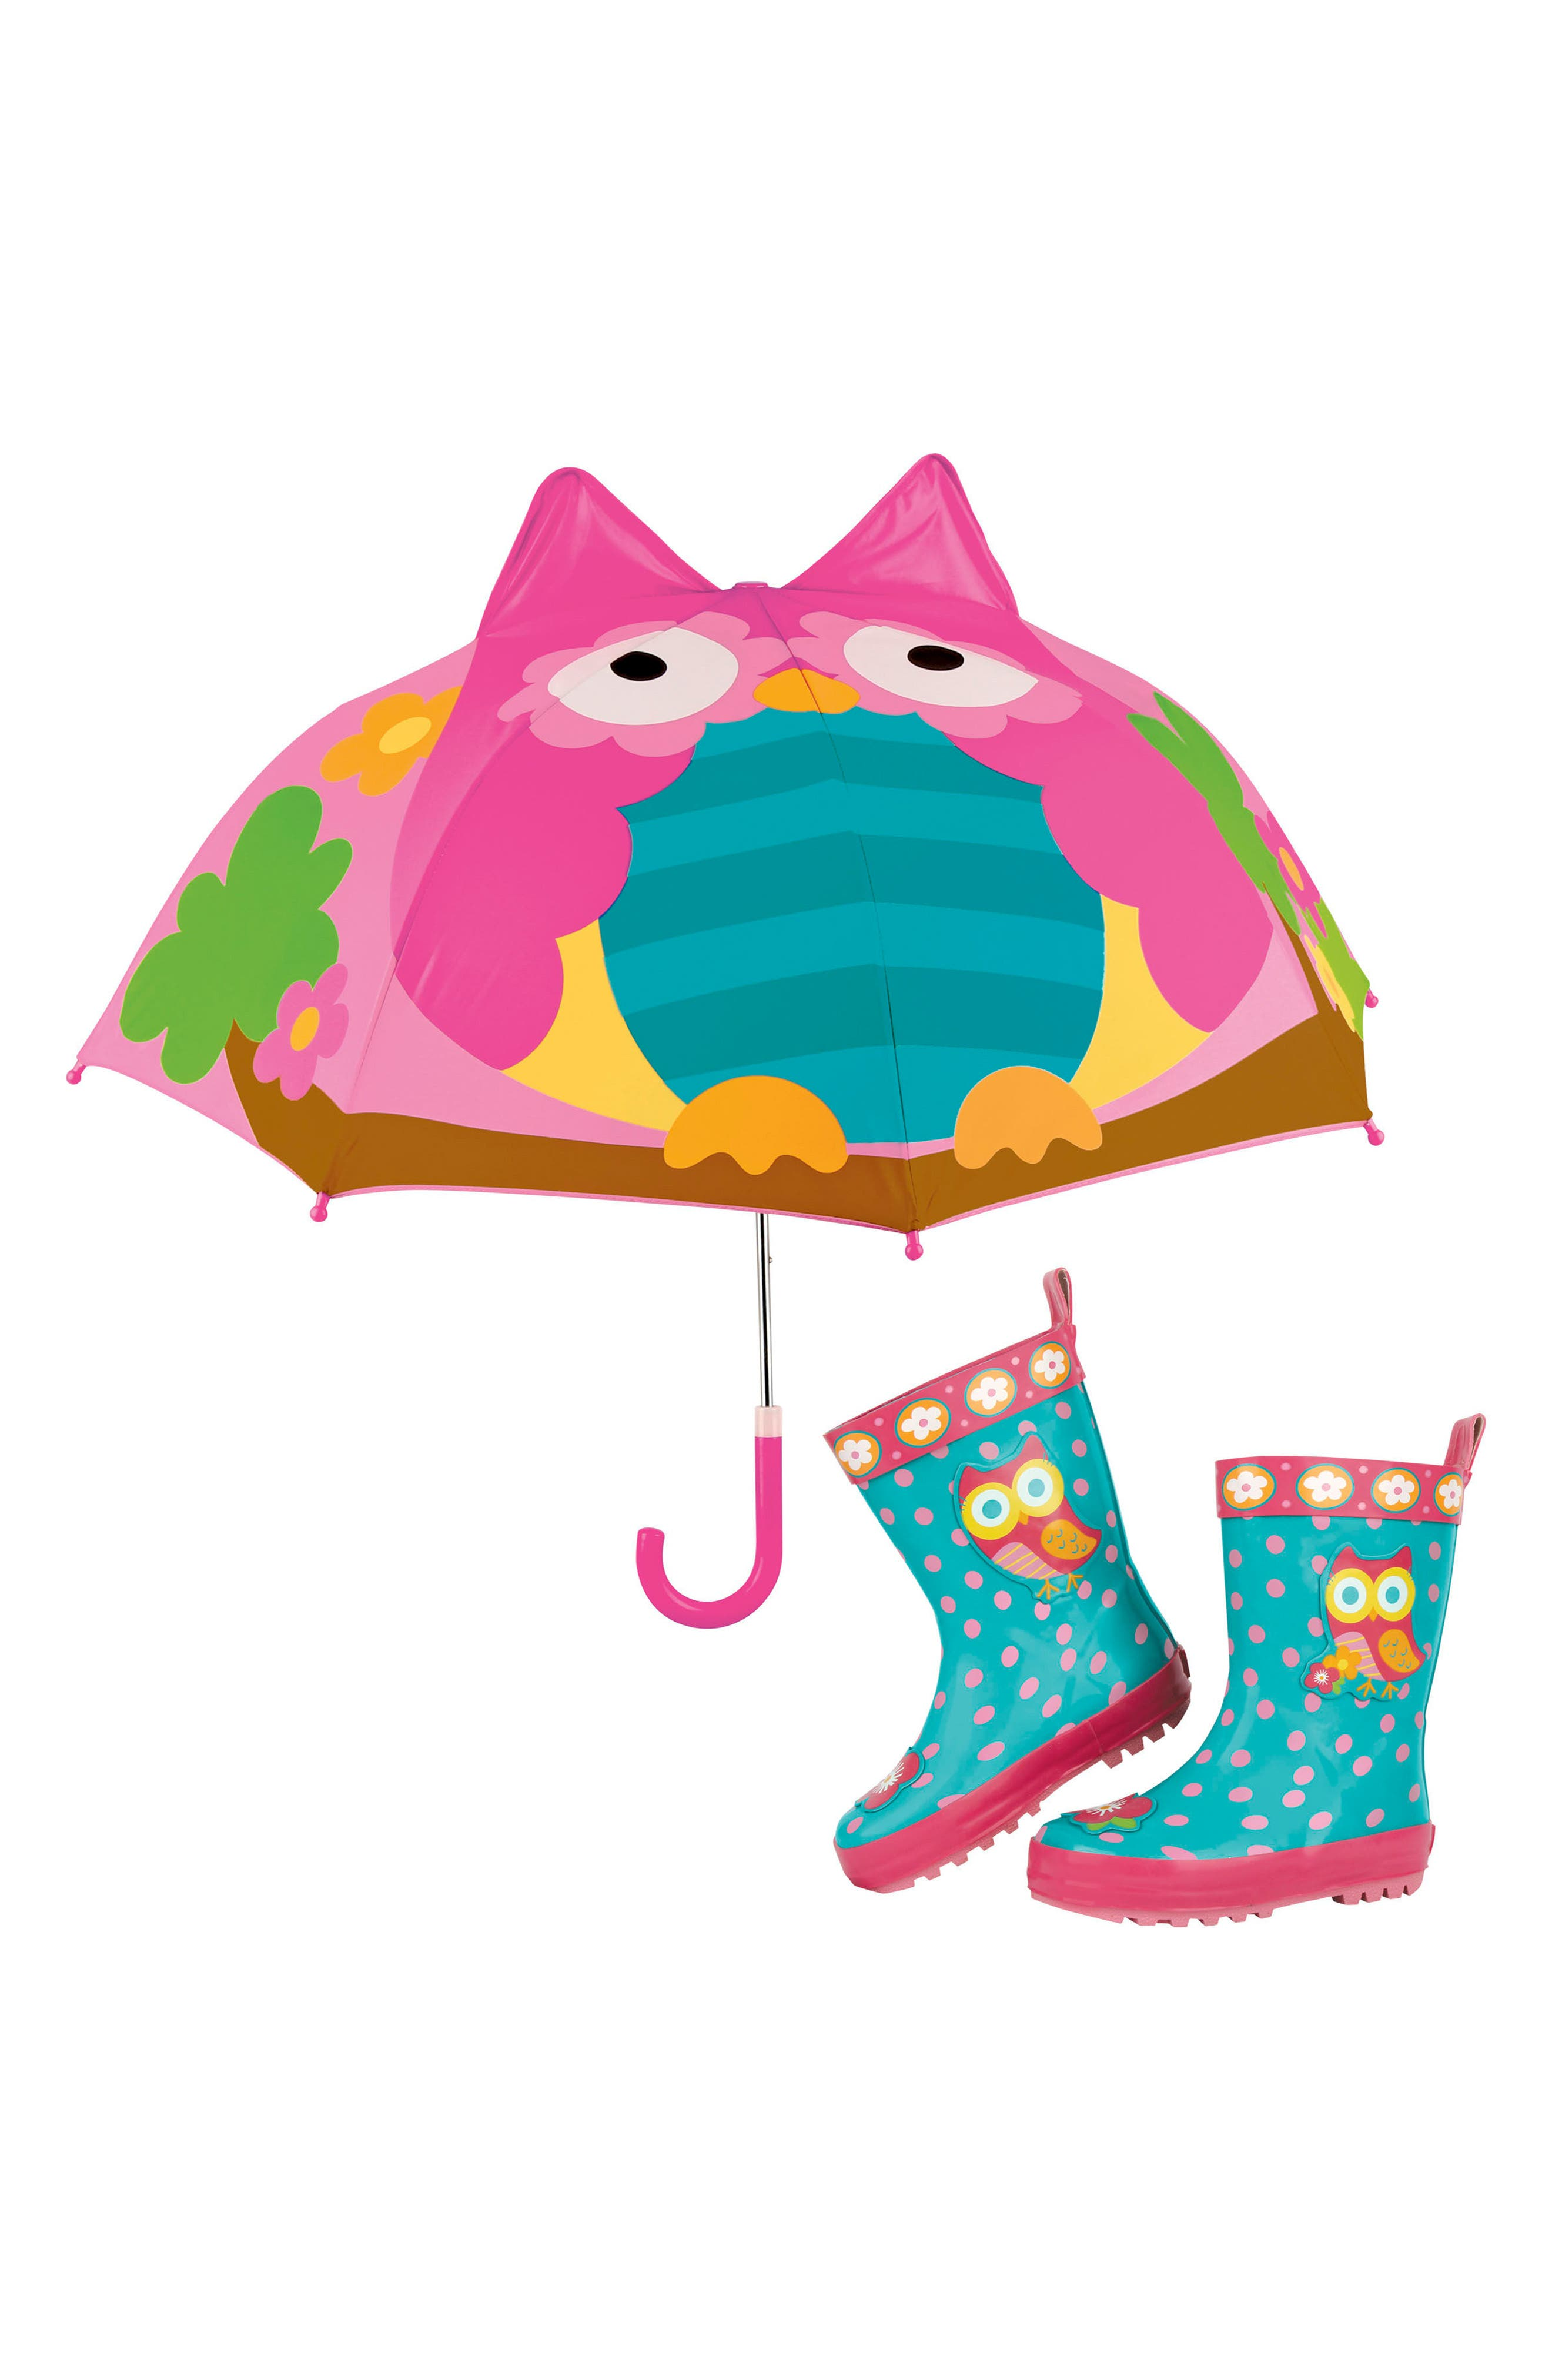 Alternate Image 1 Selected - Stephen Joseph Owl Rain Boots & Umbrella Set (Walker & Toddler)